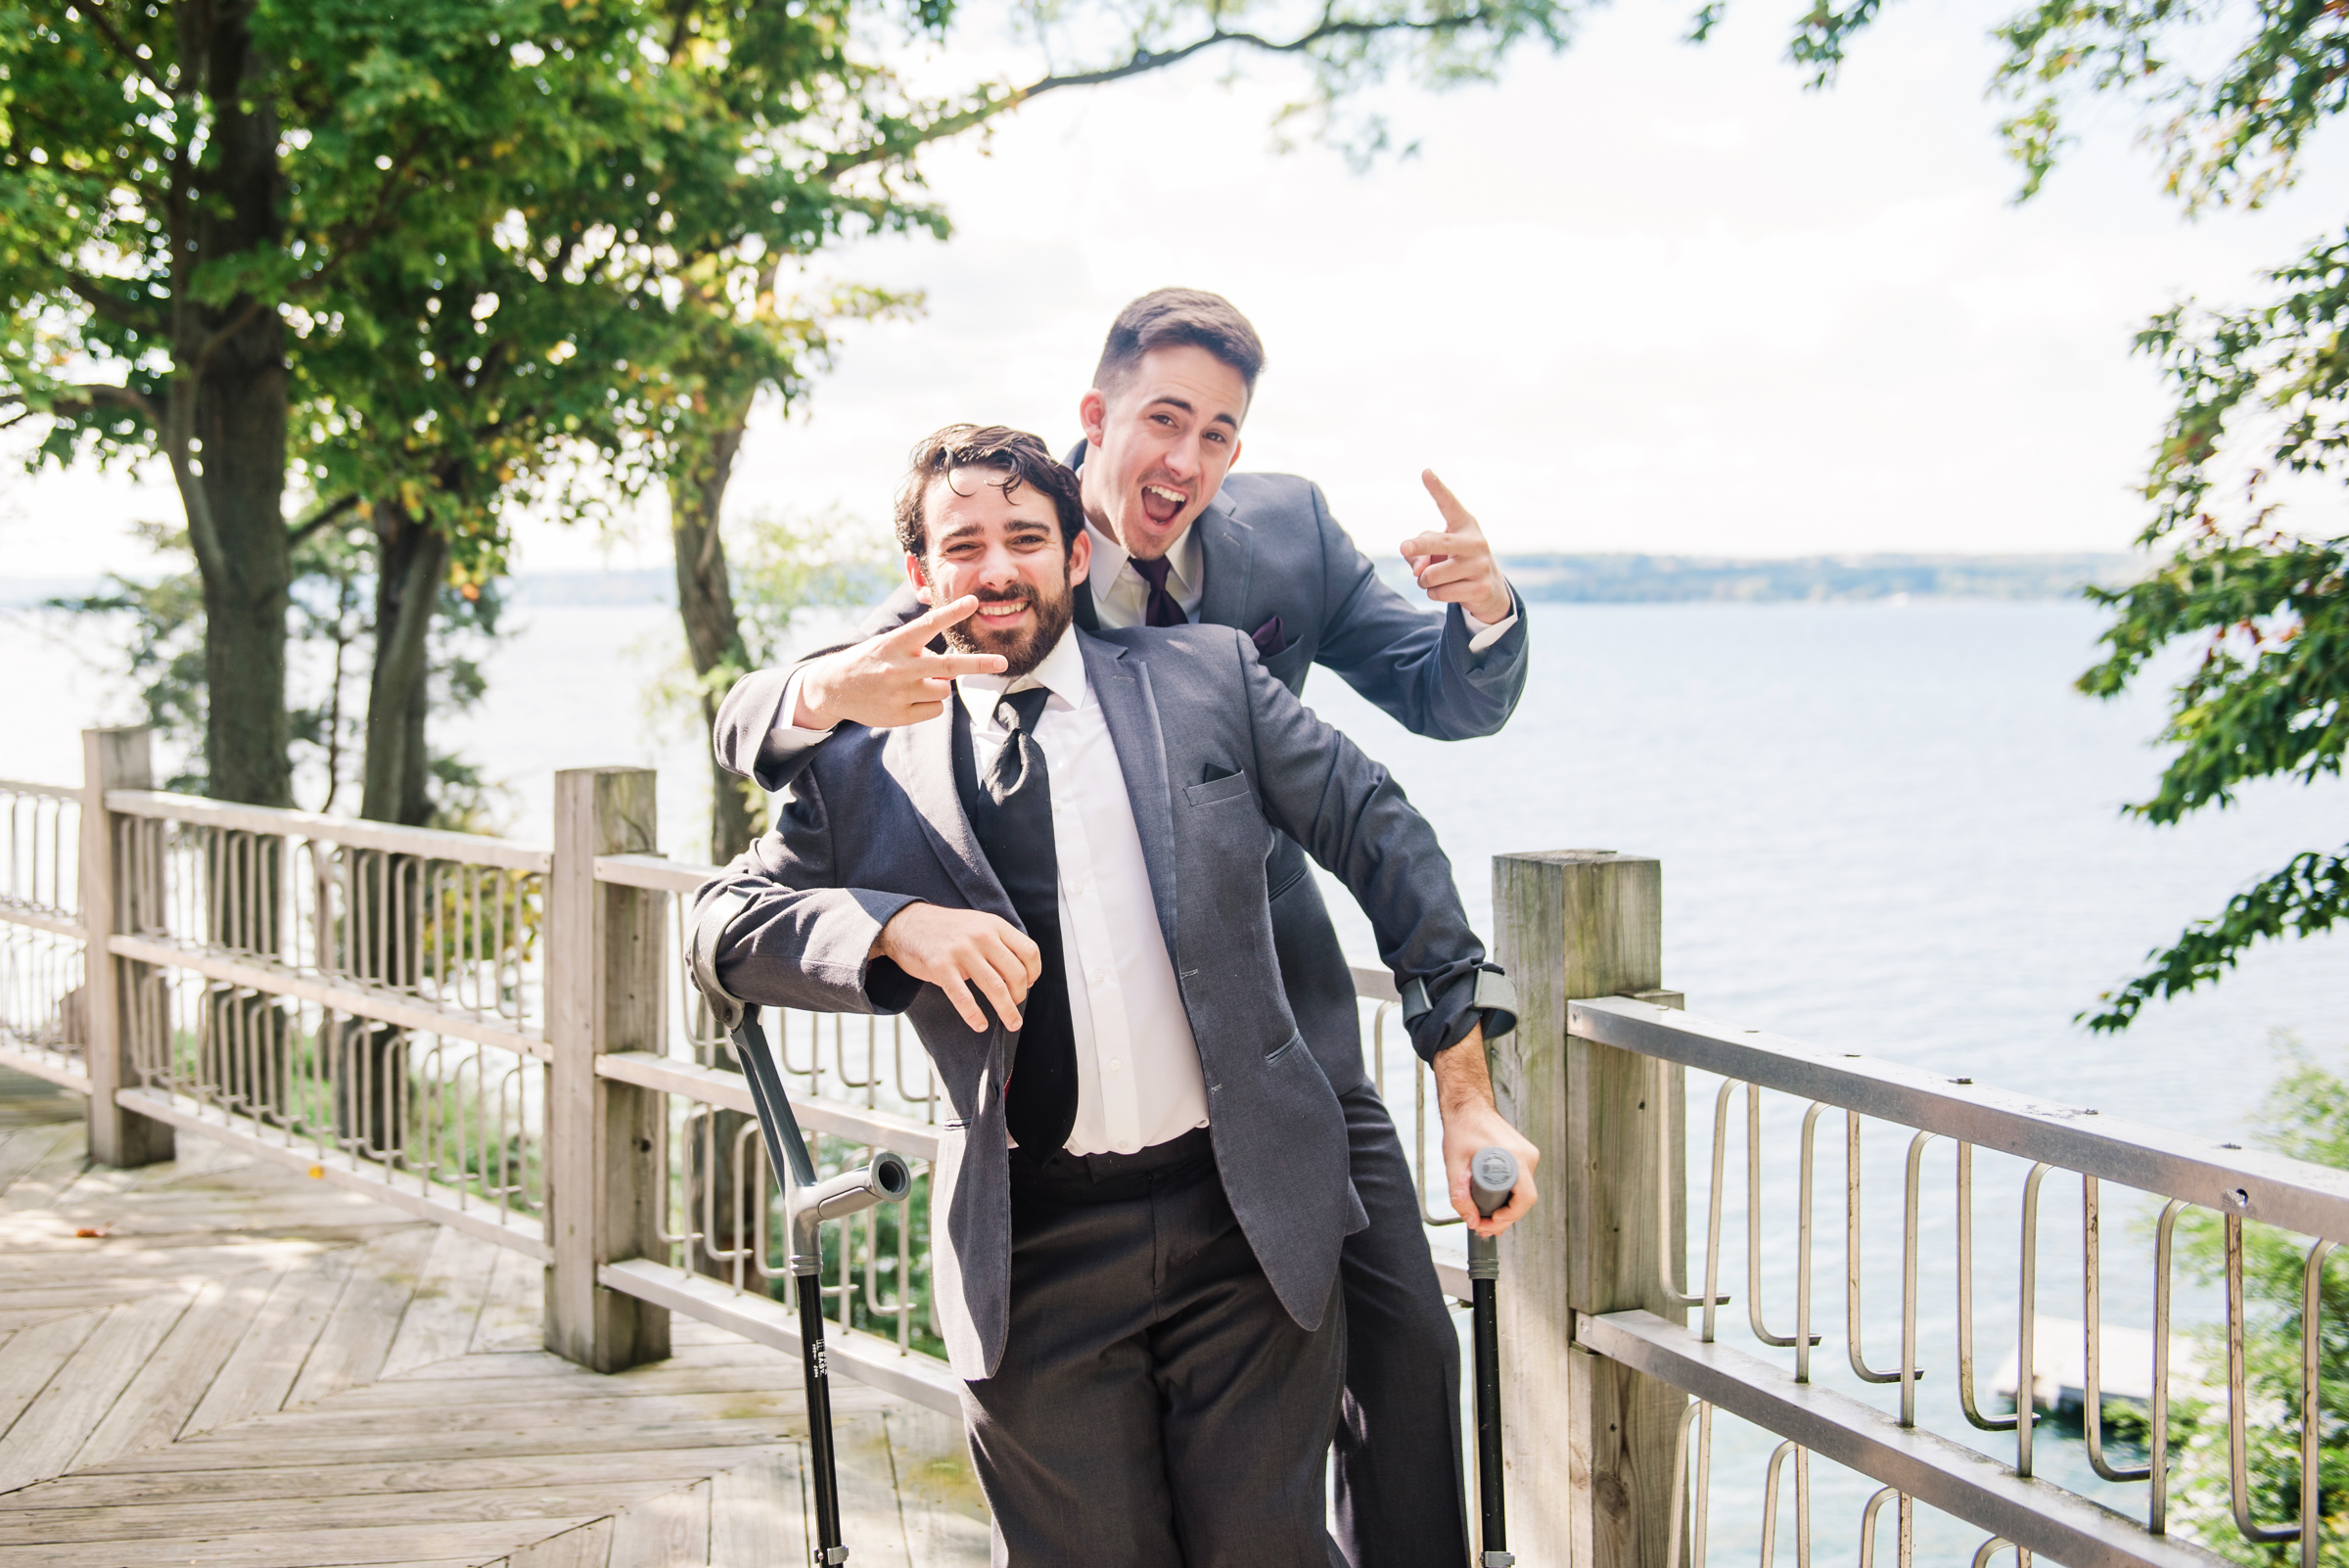 Zugibe_Vineyards_Finger_Lakes_Wedding_JILL_STUDIO_Rochester_NY_Photographer_DSC_3380.jpg